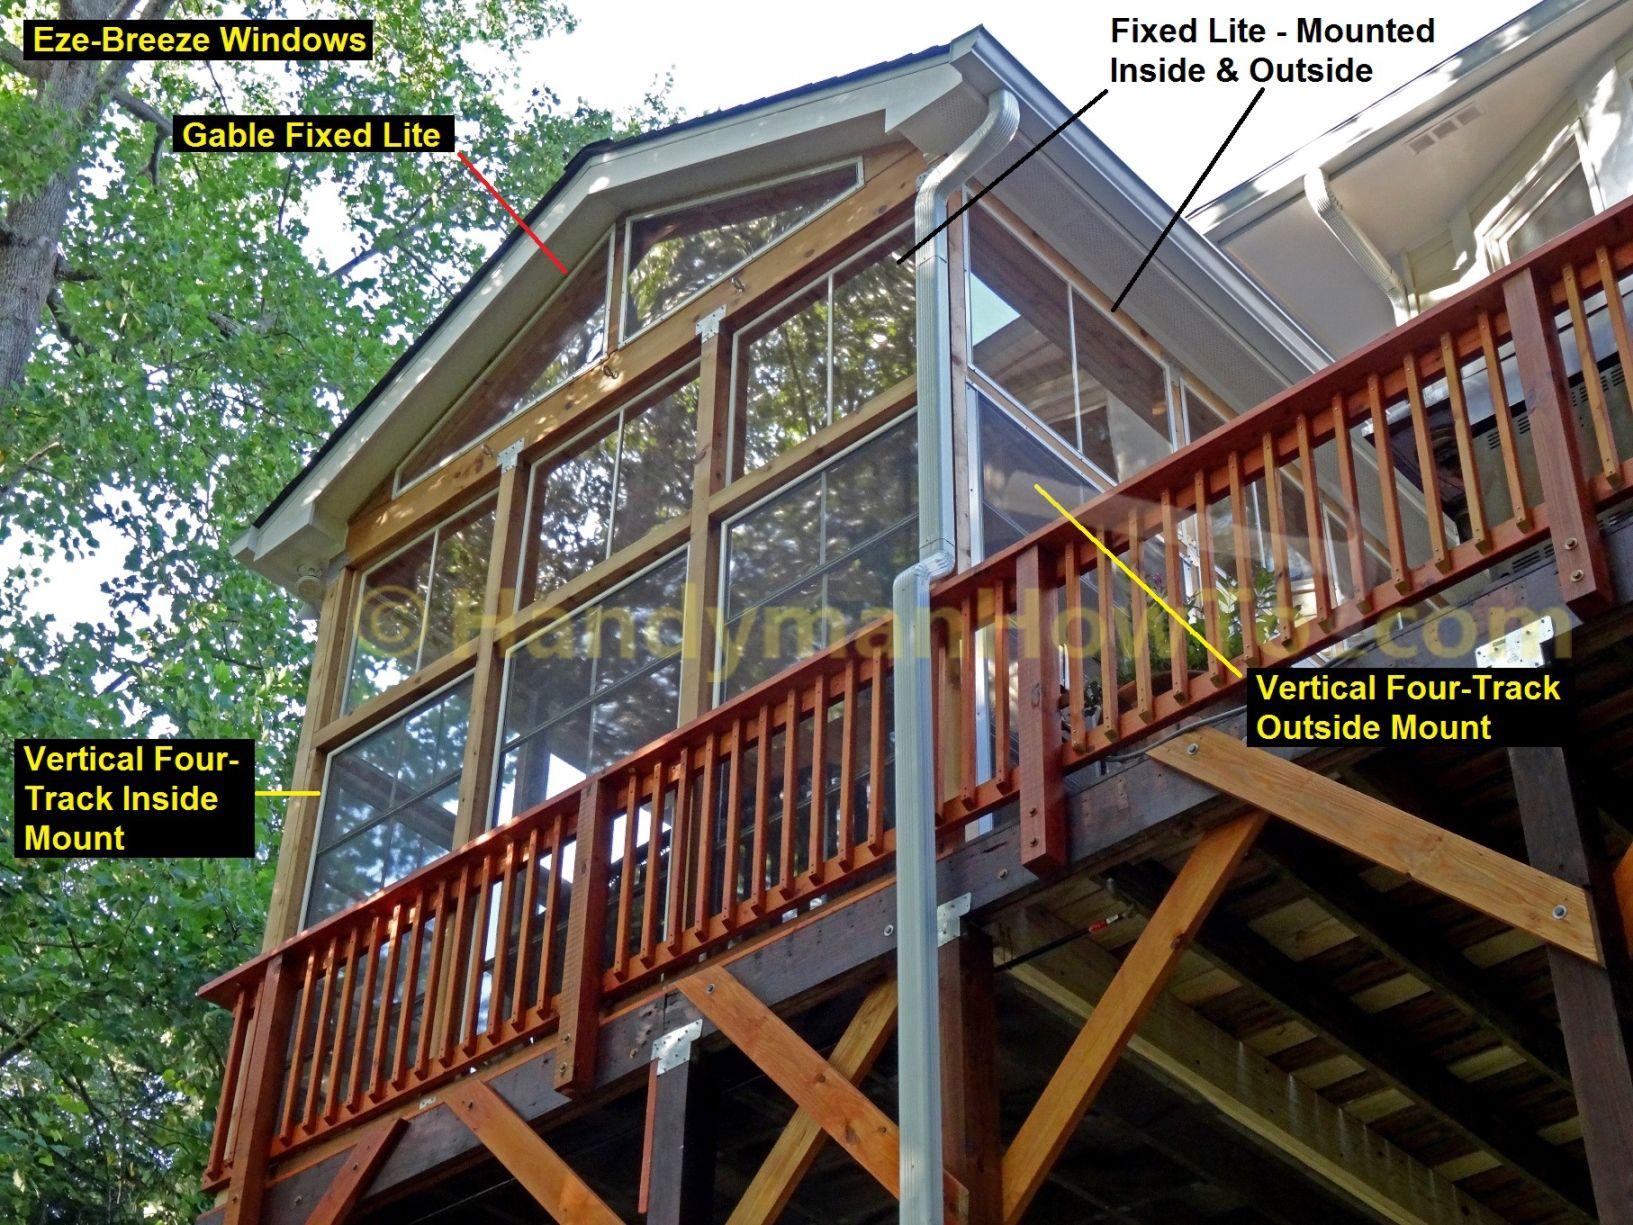 eze breeze windows reviews cleaning eze breeze windows reviews for impressive home design porch with wooden railing